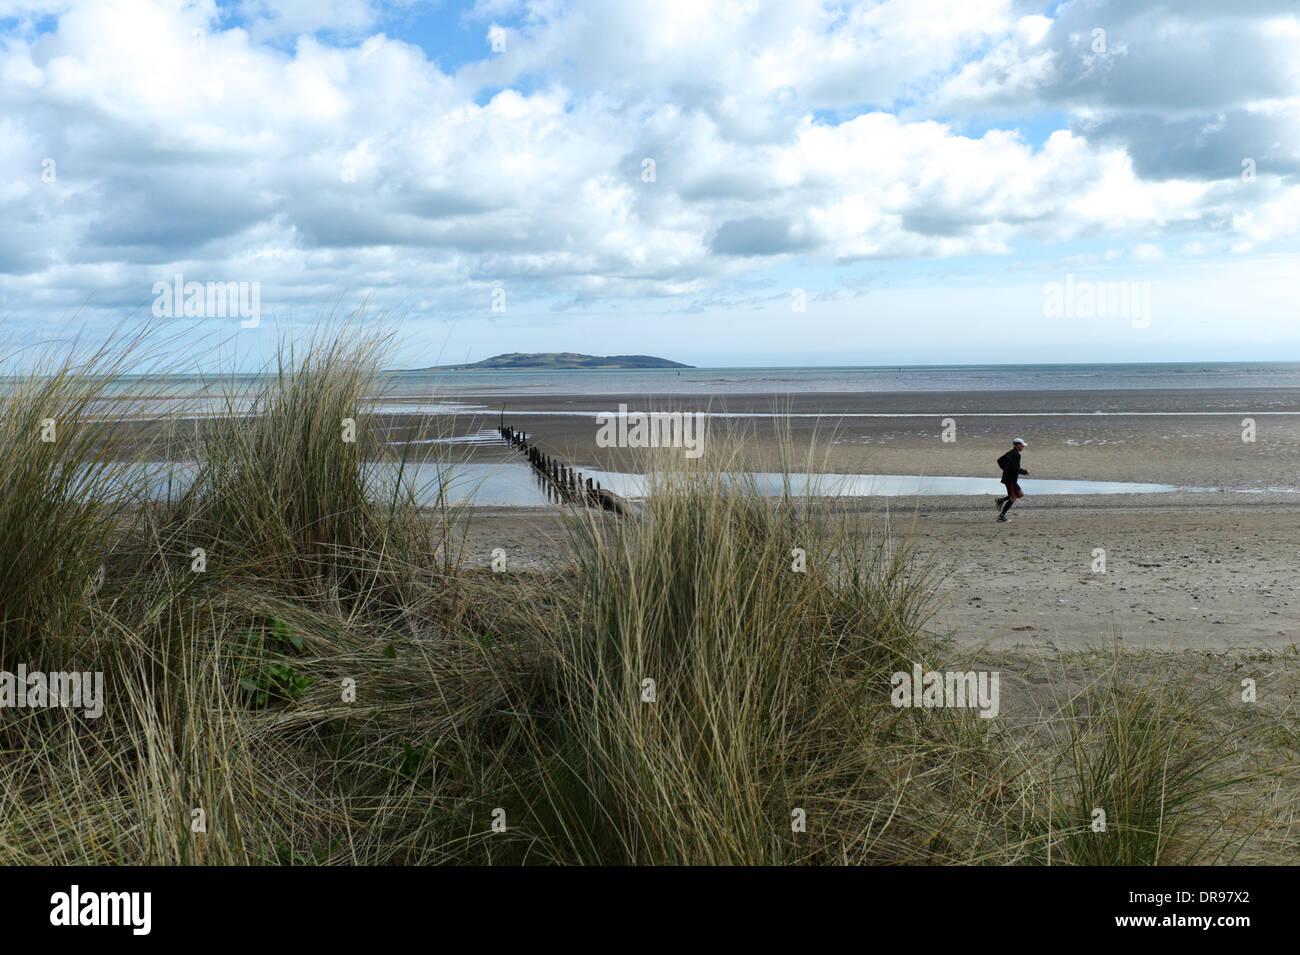 Jogger on the beach at MALAHIDE, Dublin, Ireland, looking across to Lambay Island  - APRIL 2013 - Stock Image